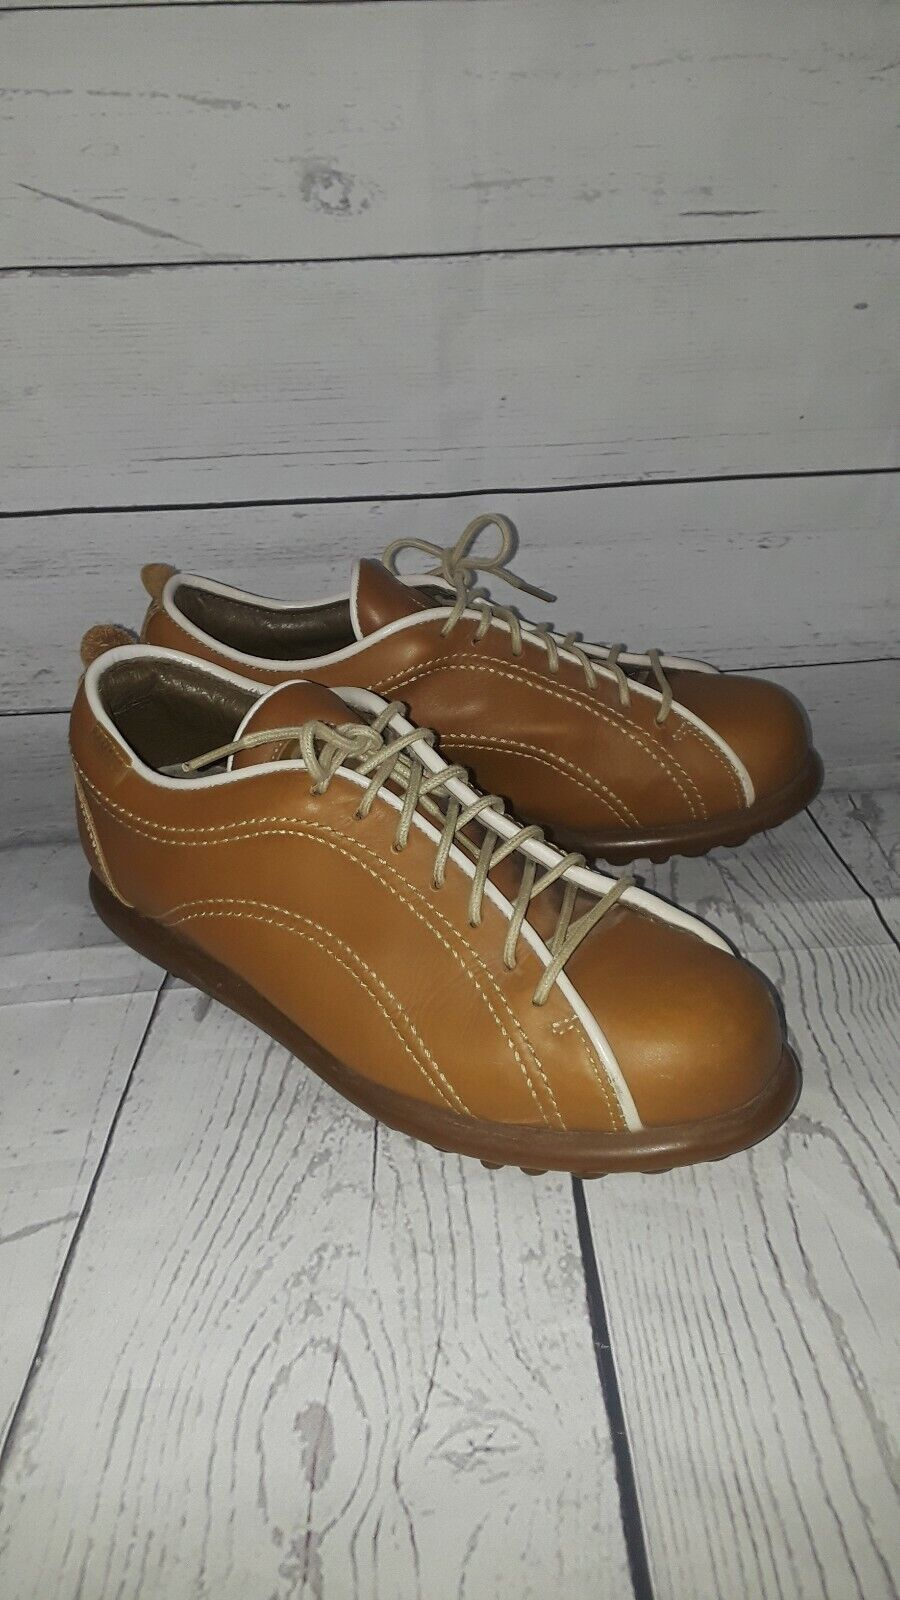 CAMPER women shoes sz 8.5 Europe 39 orange leather 03793 040 GT